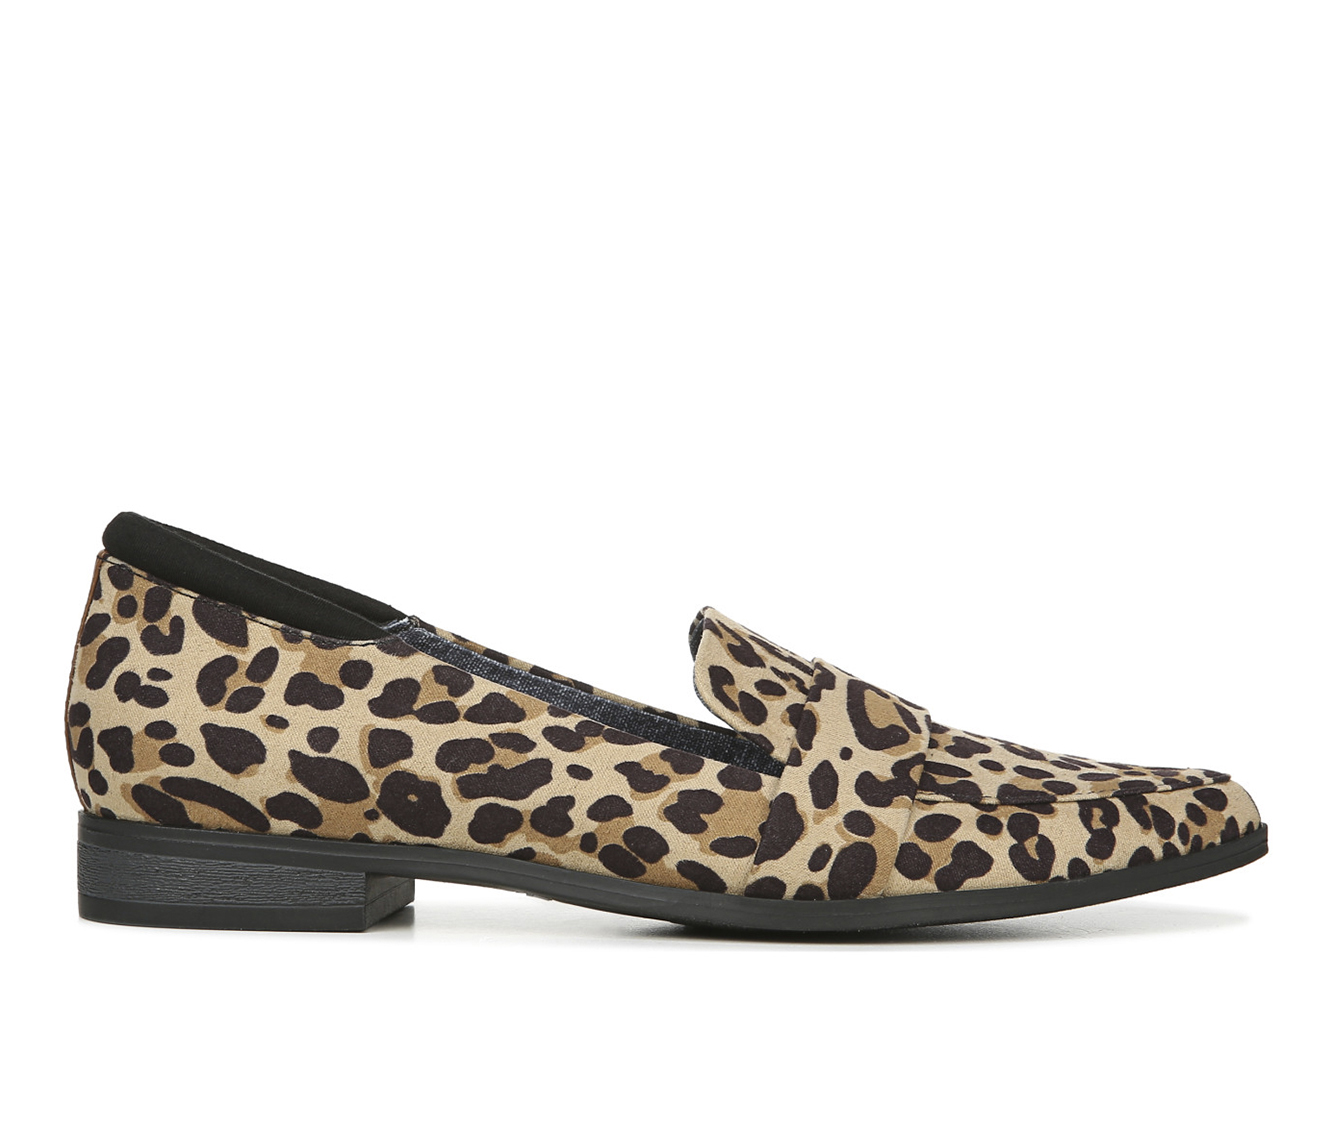 Dr. Scholls Leo Women's Shoe (Brown Canvas)